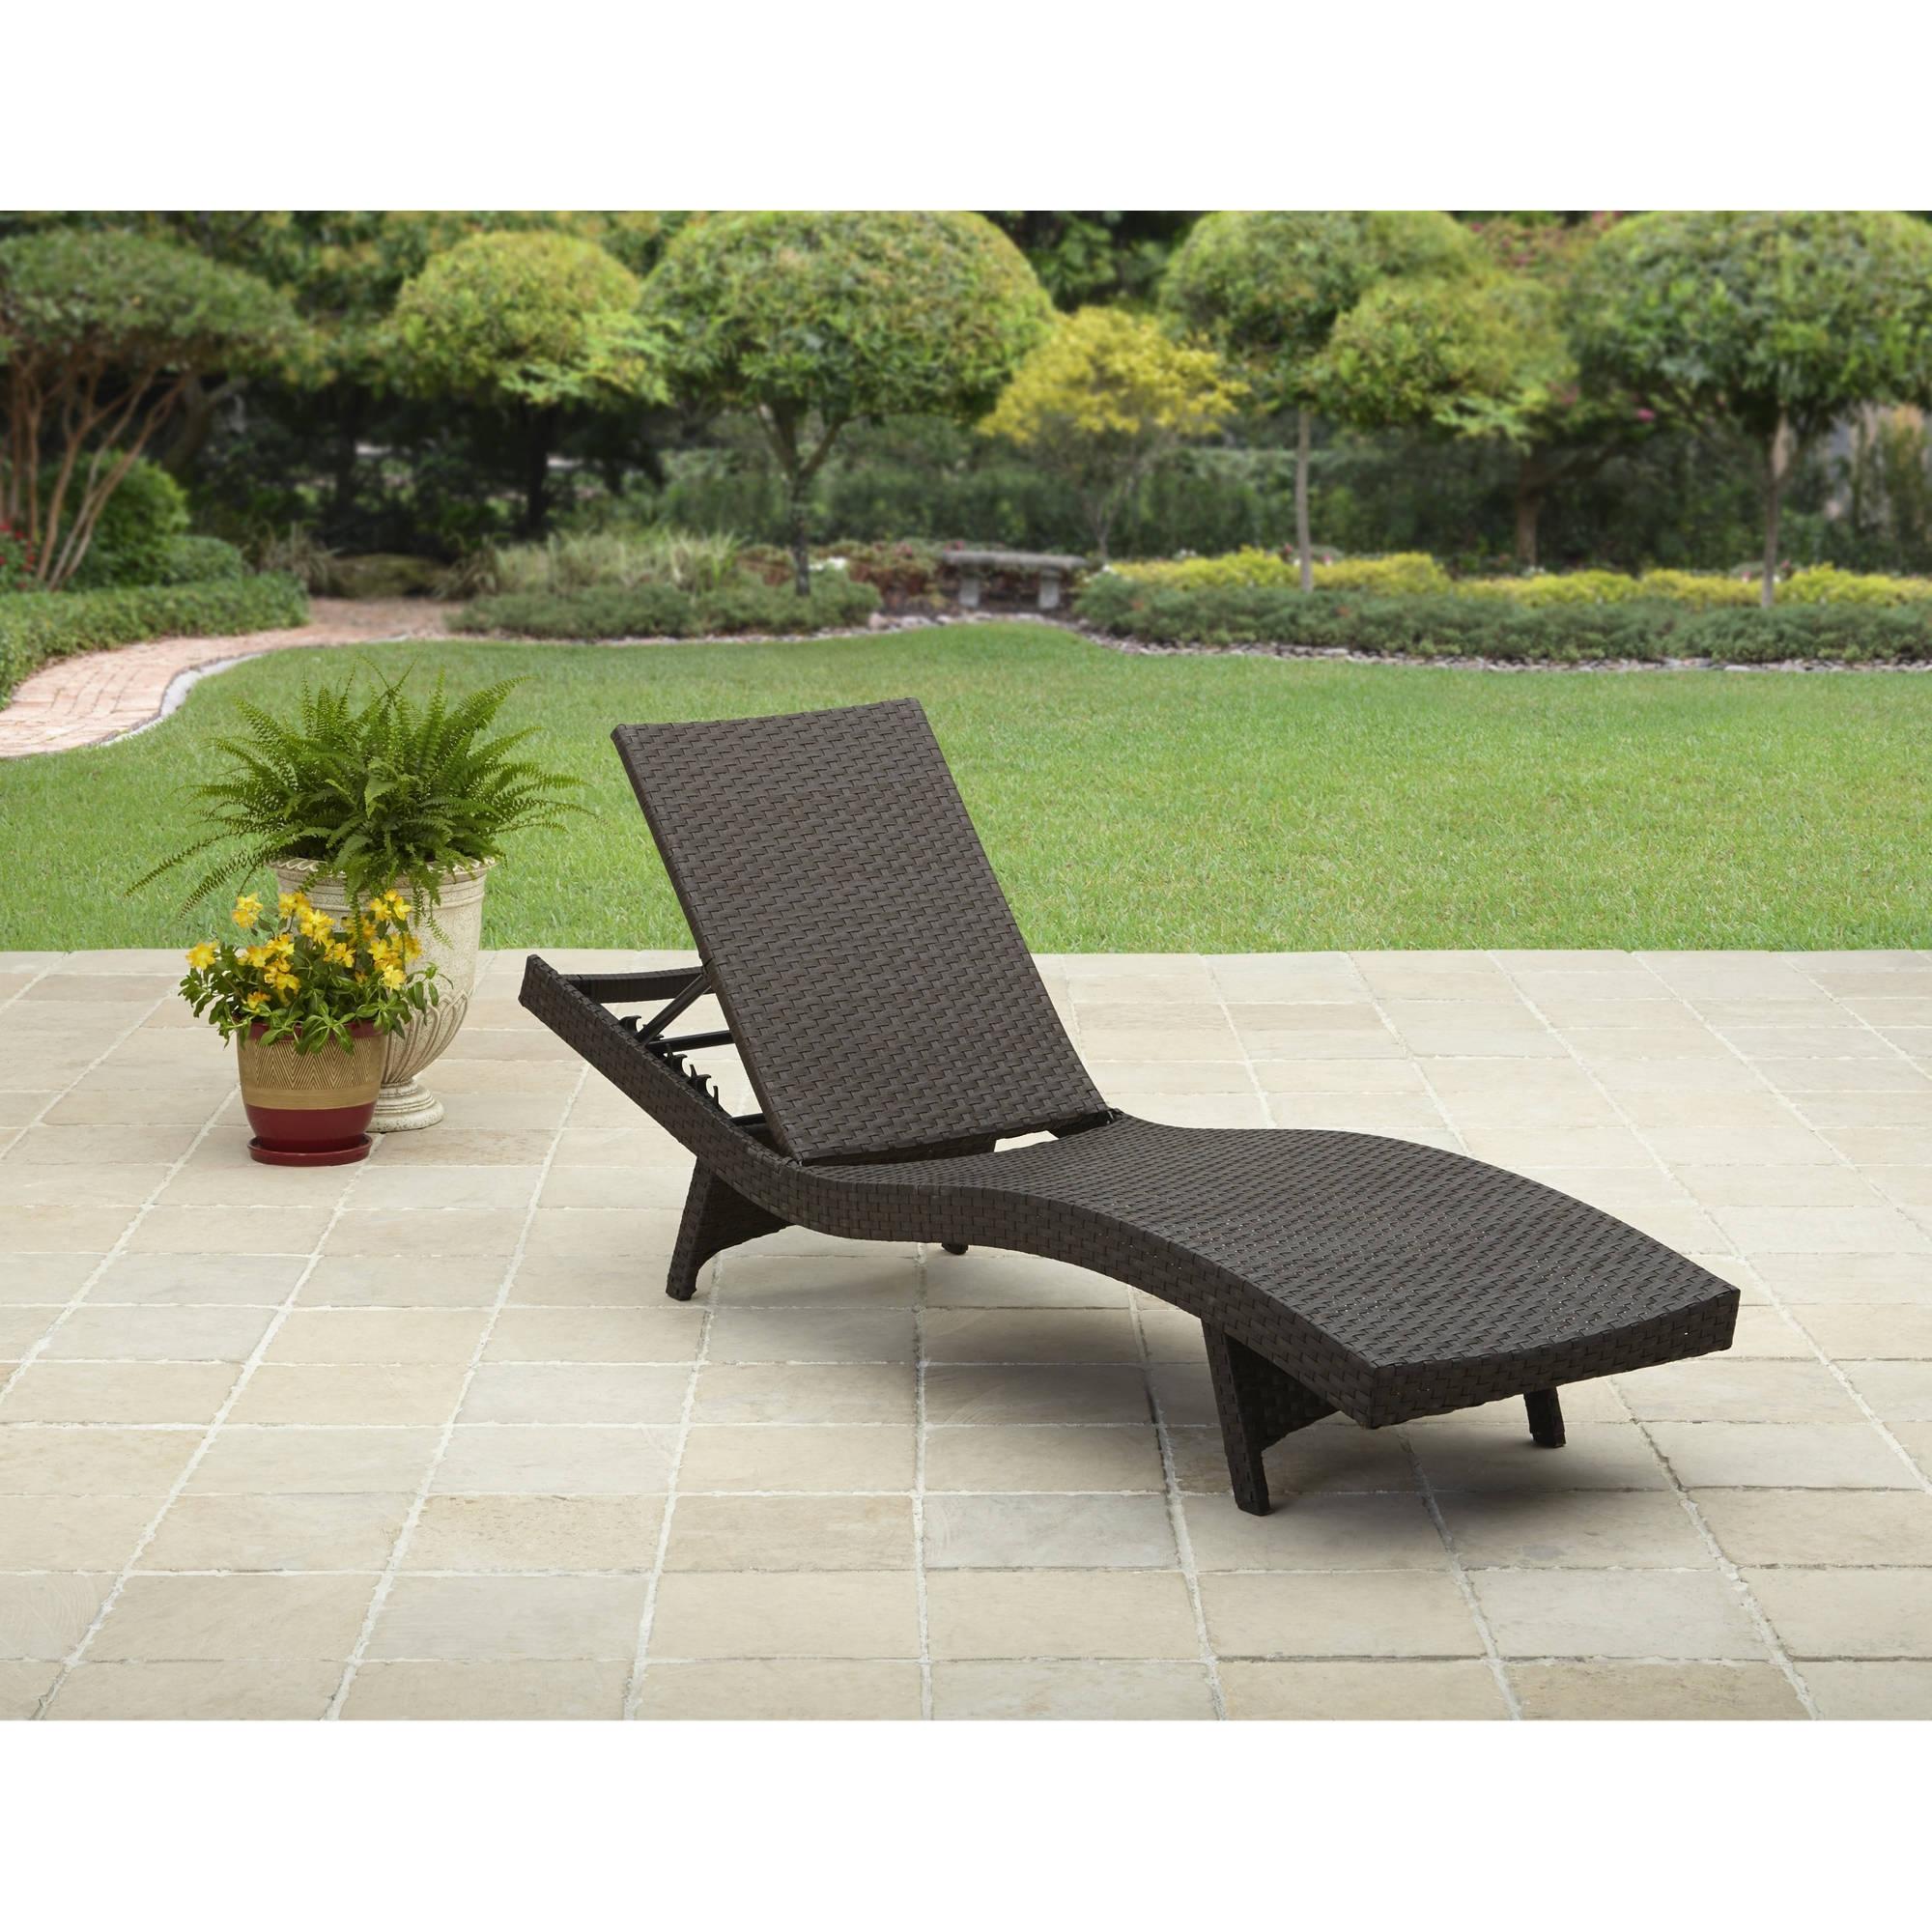 Walmart Chaise Lounge Cushions Regarding Latest Better Homes And Gardens Avila Beach Chaise – Walmart (View 7 of 15)